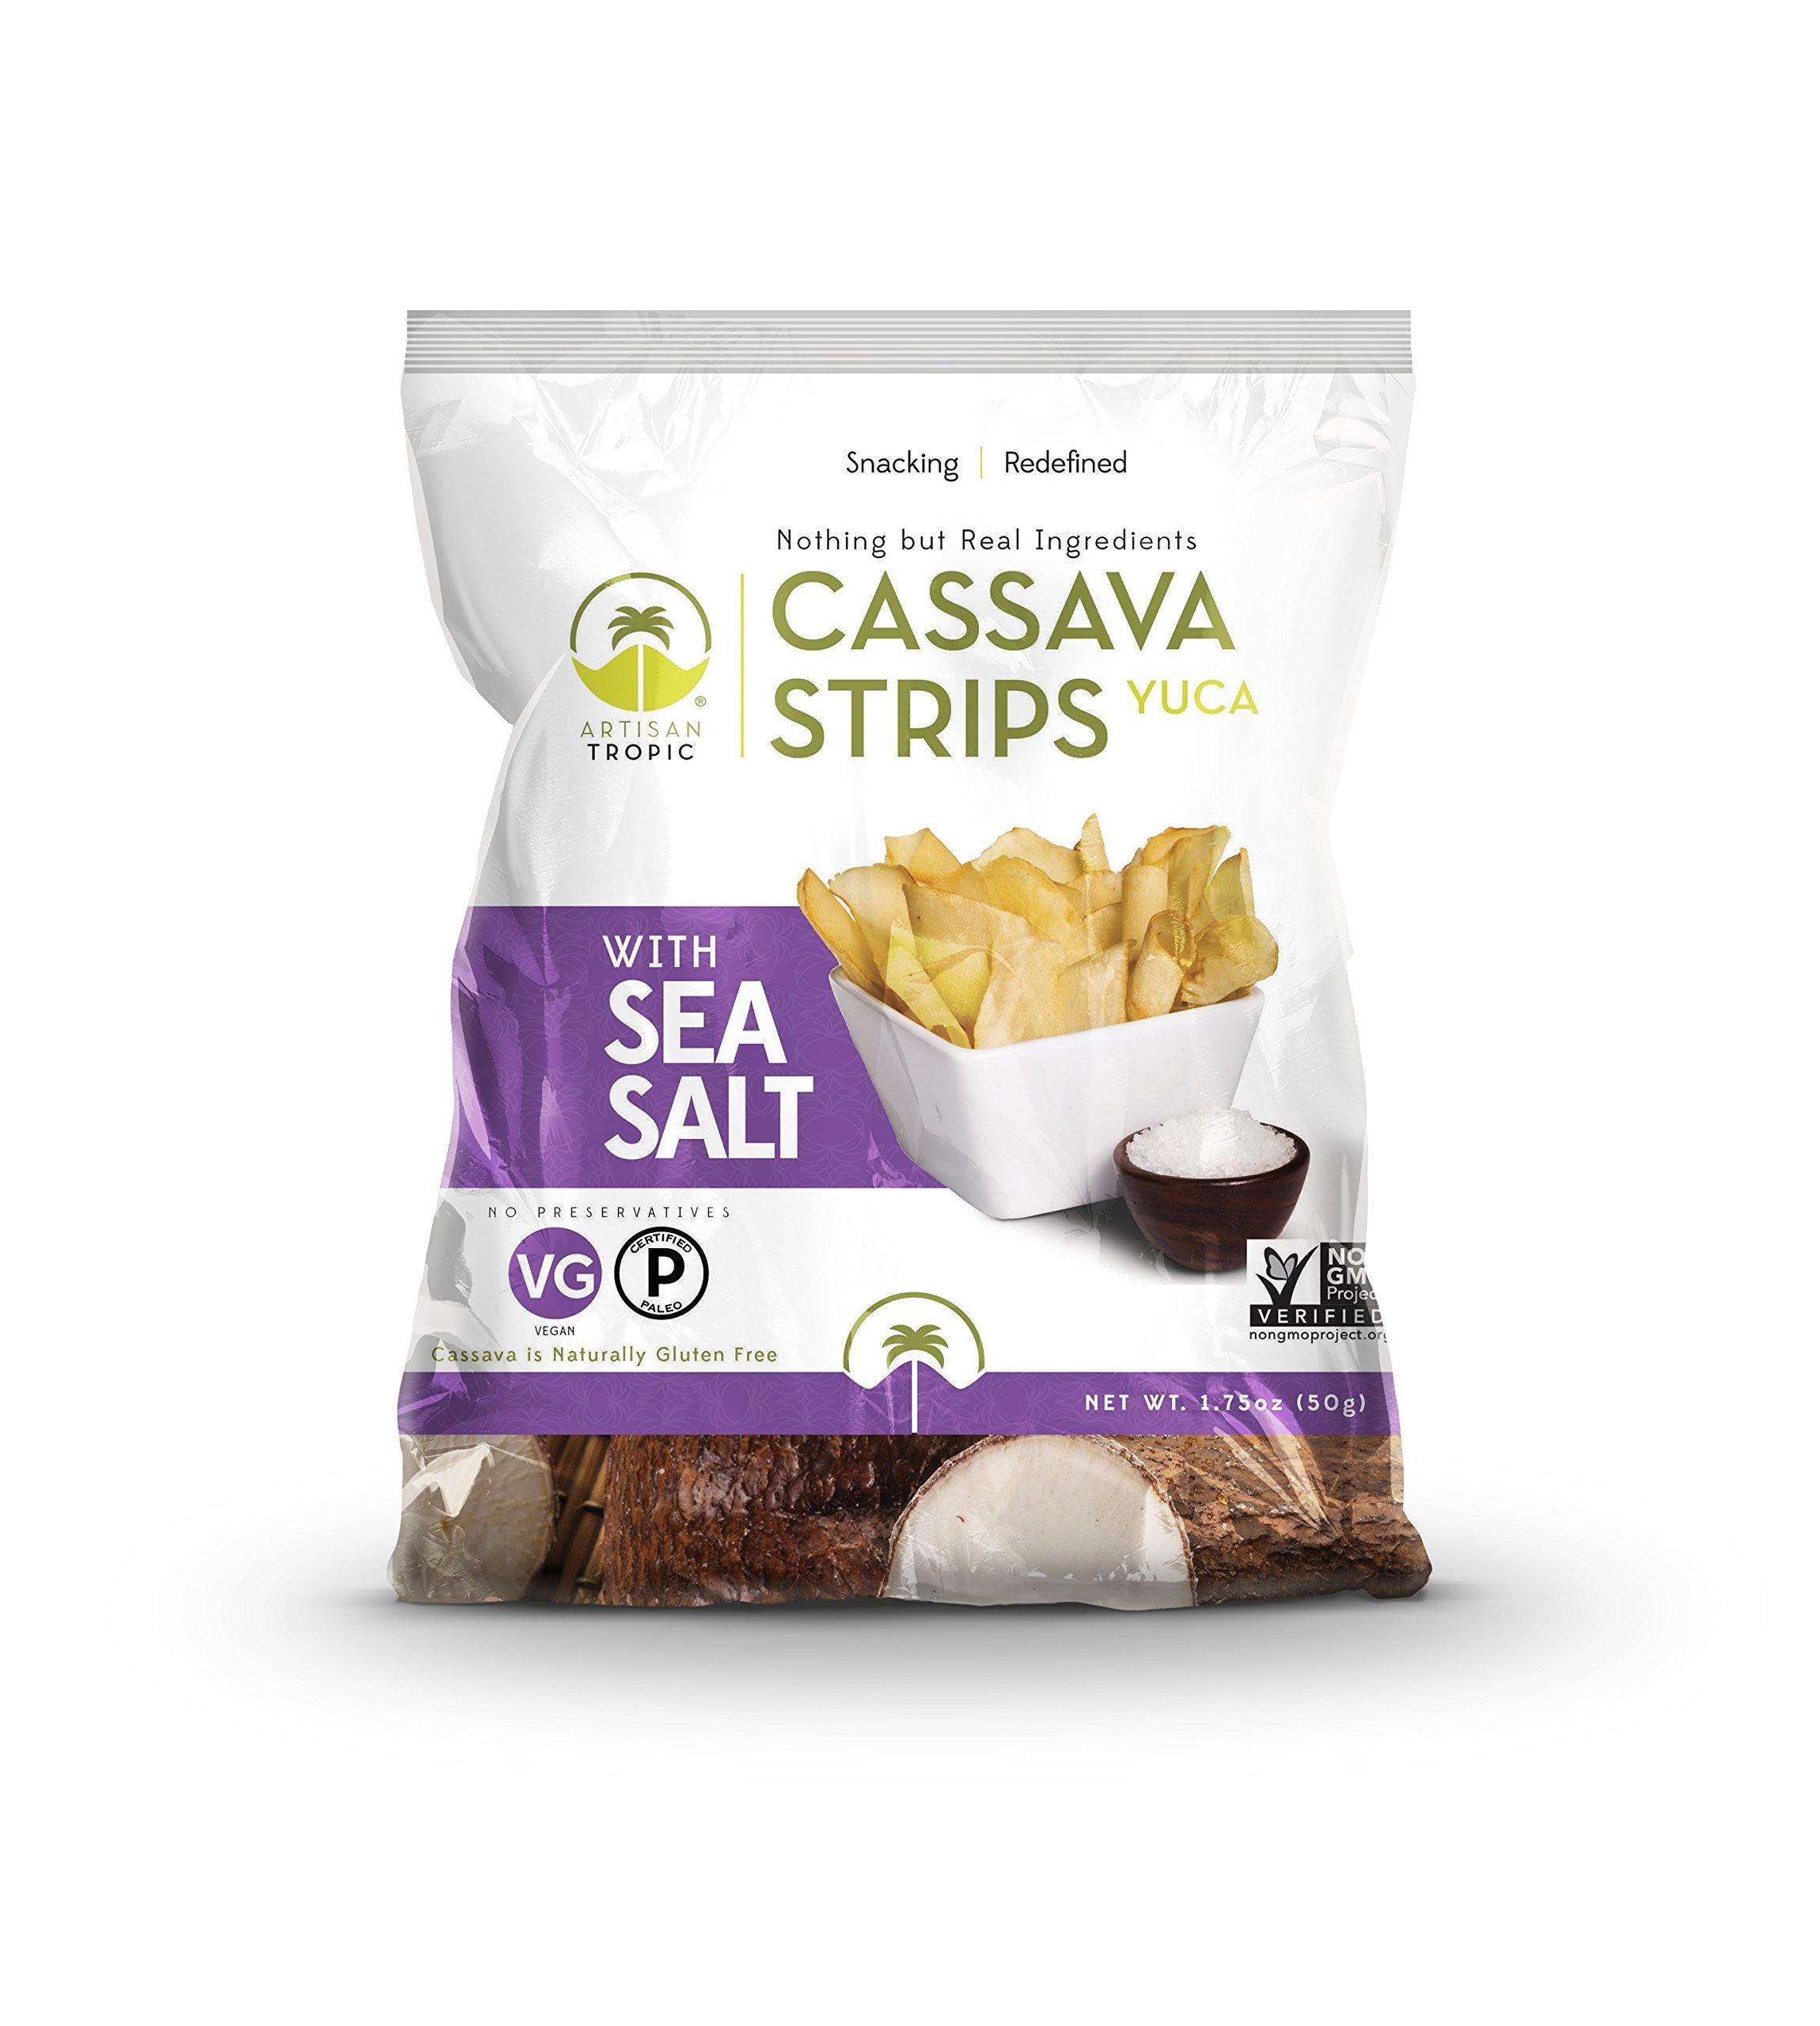 Artisan Tropic Cassava (Yuca) Strips: Sea Salt 1.75oz (16 pack)